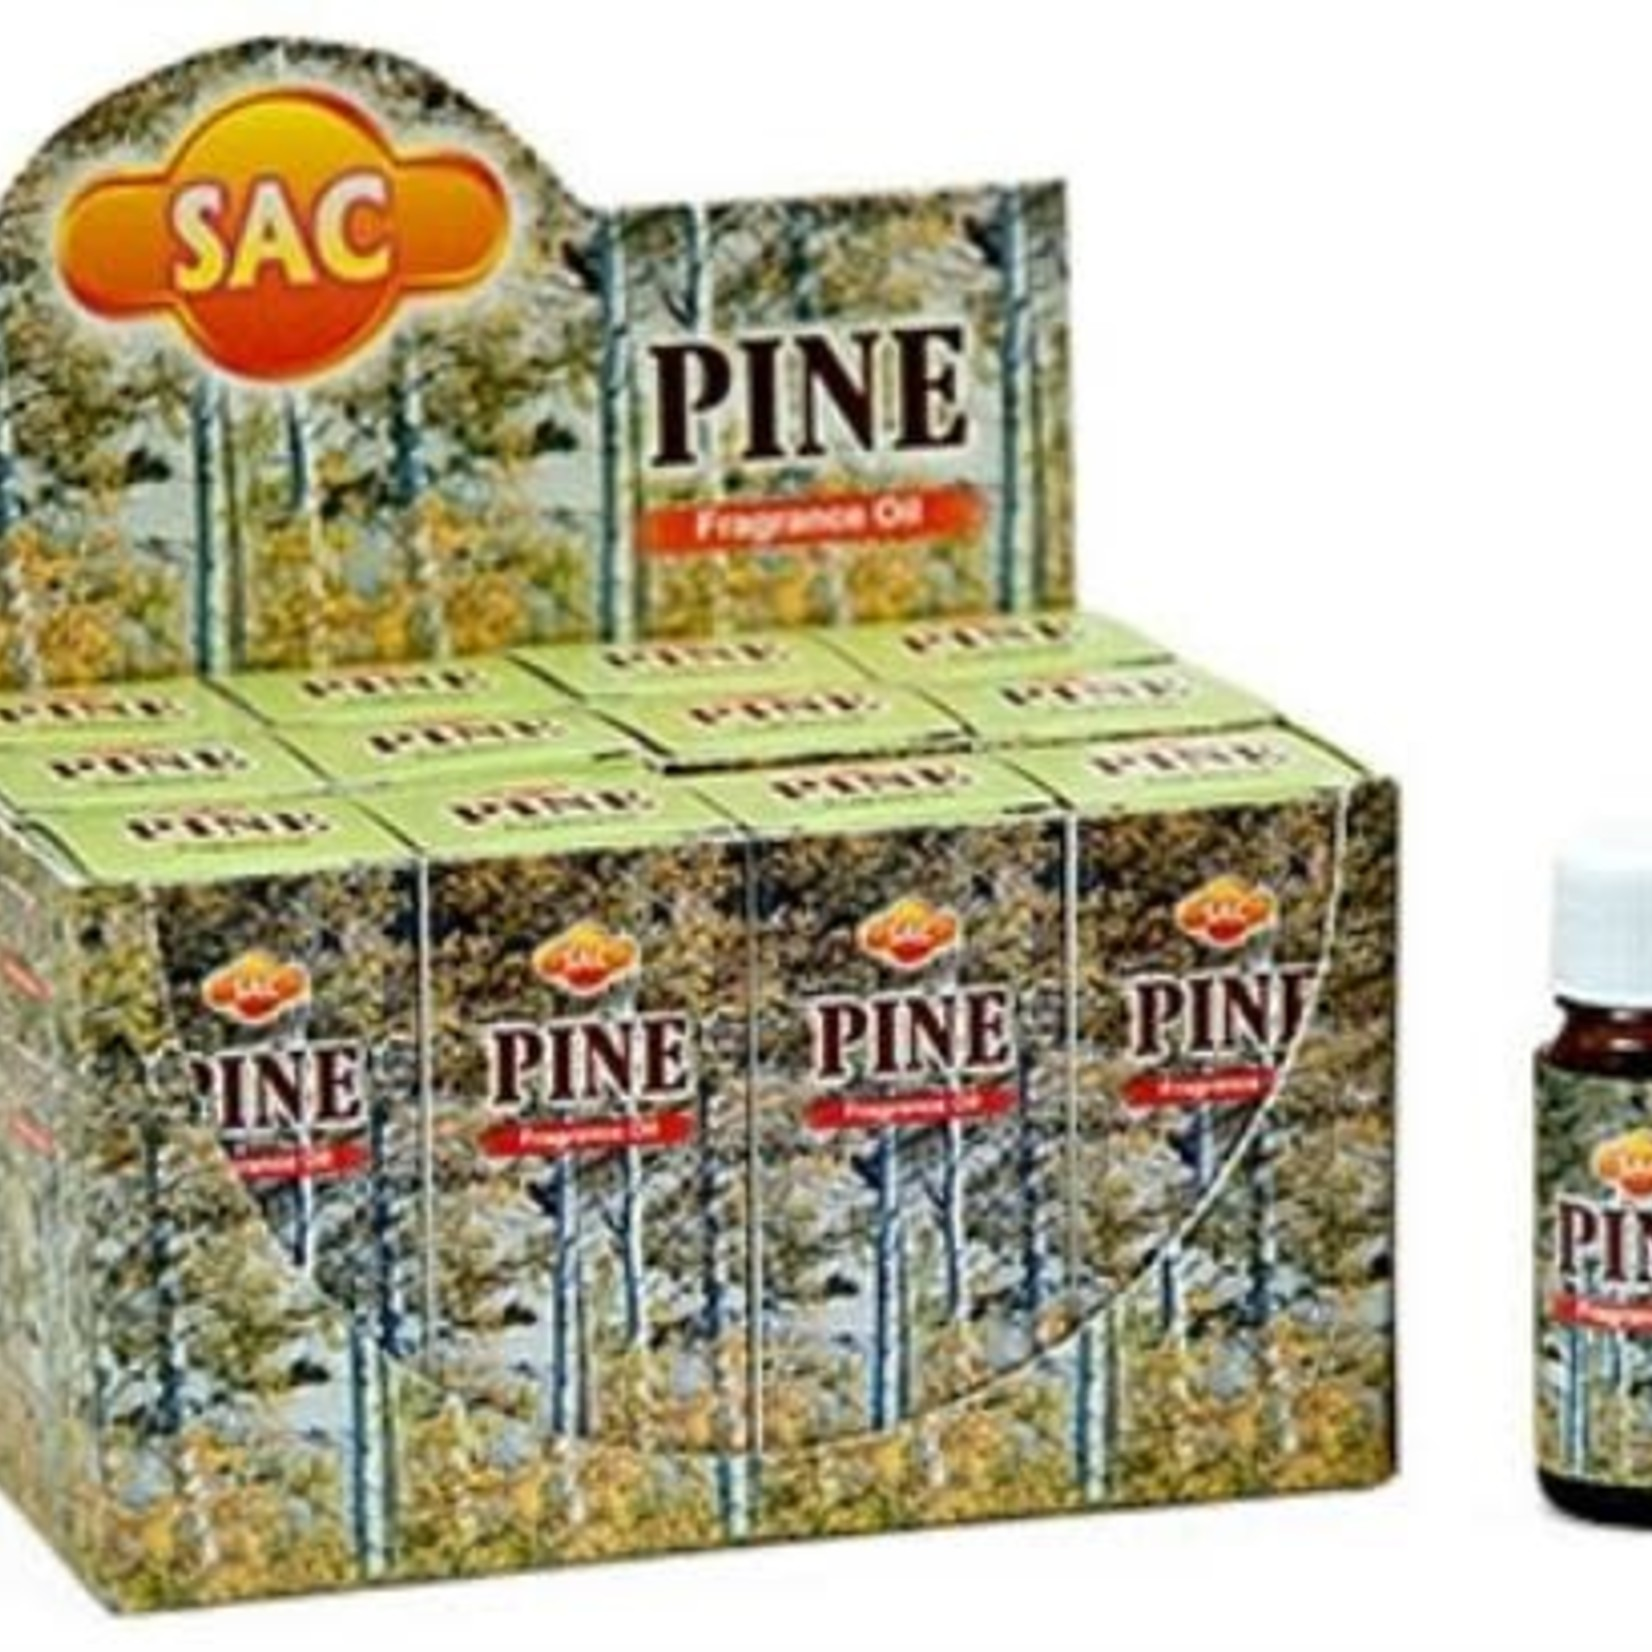 Pine Fragrance oil - SAC